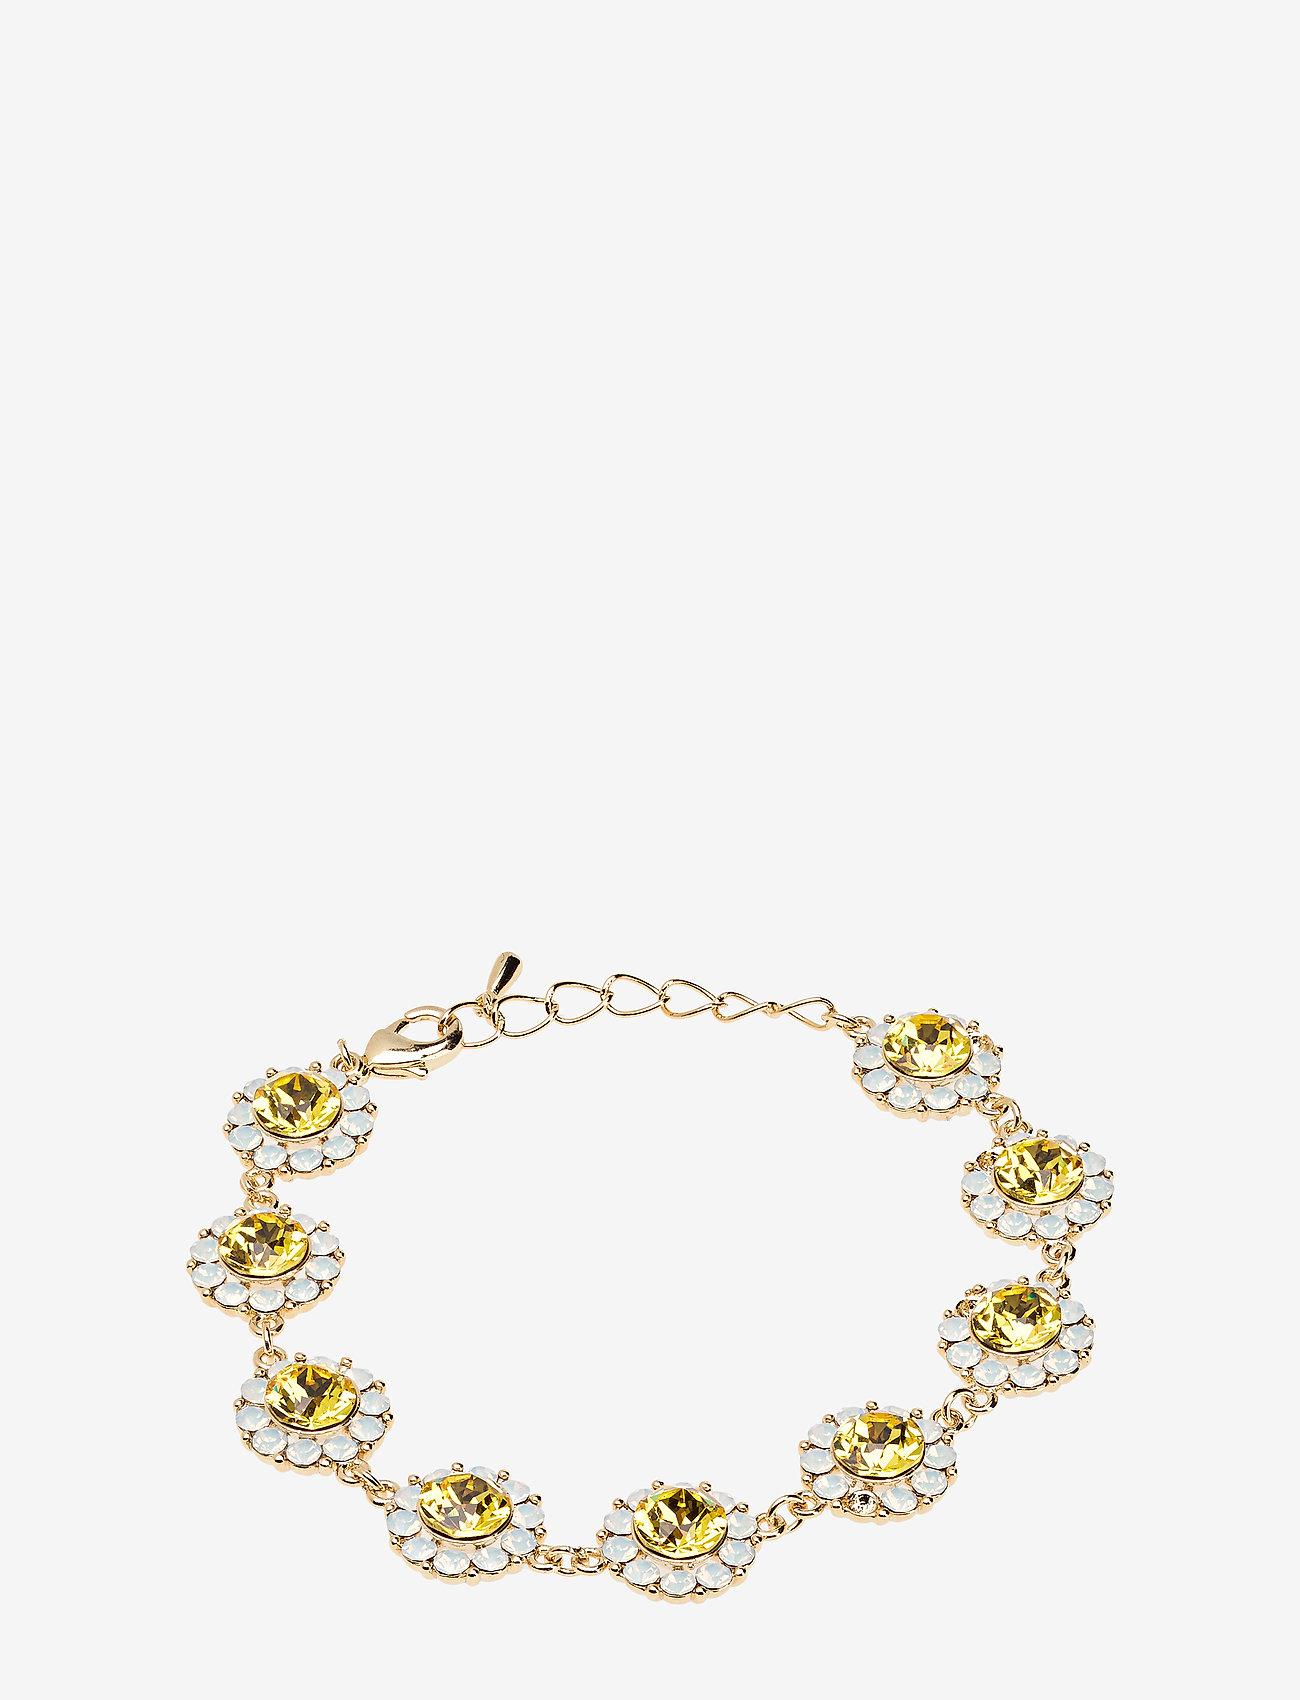 LILY AND ROSE - Sofia bracelet - Sunshine - dainty - sunshine